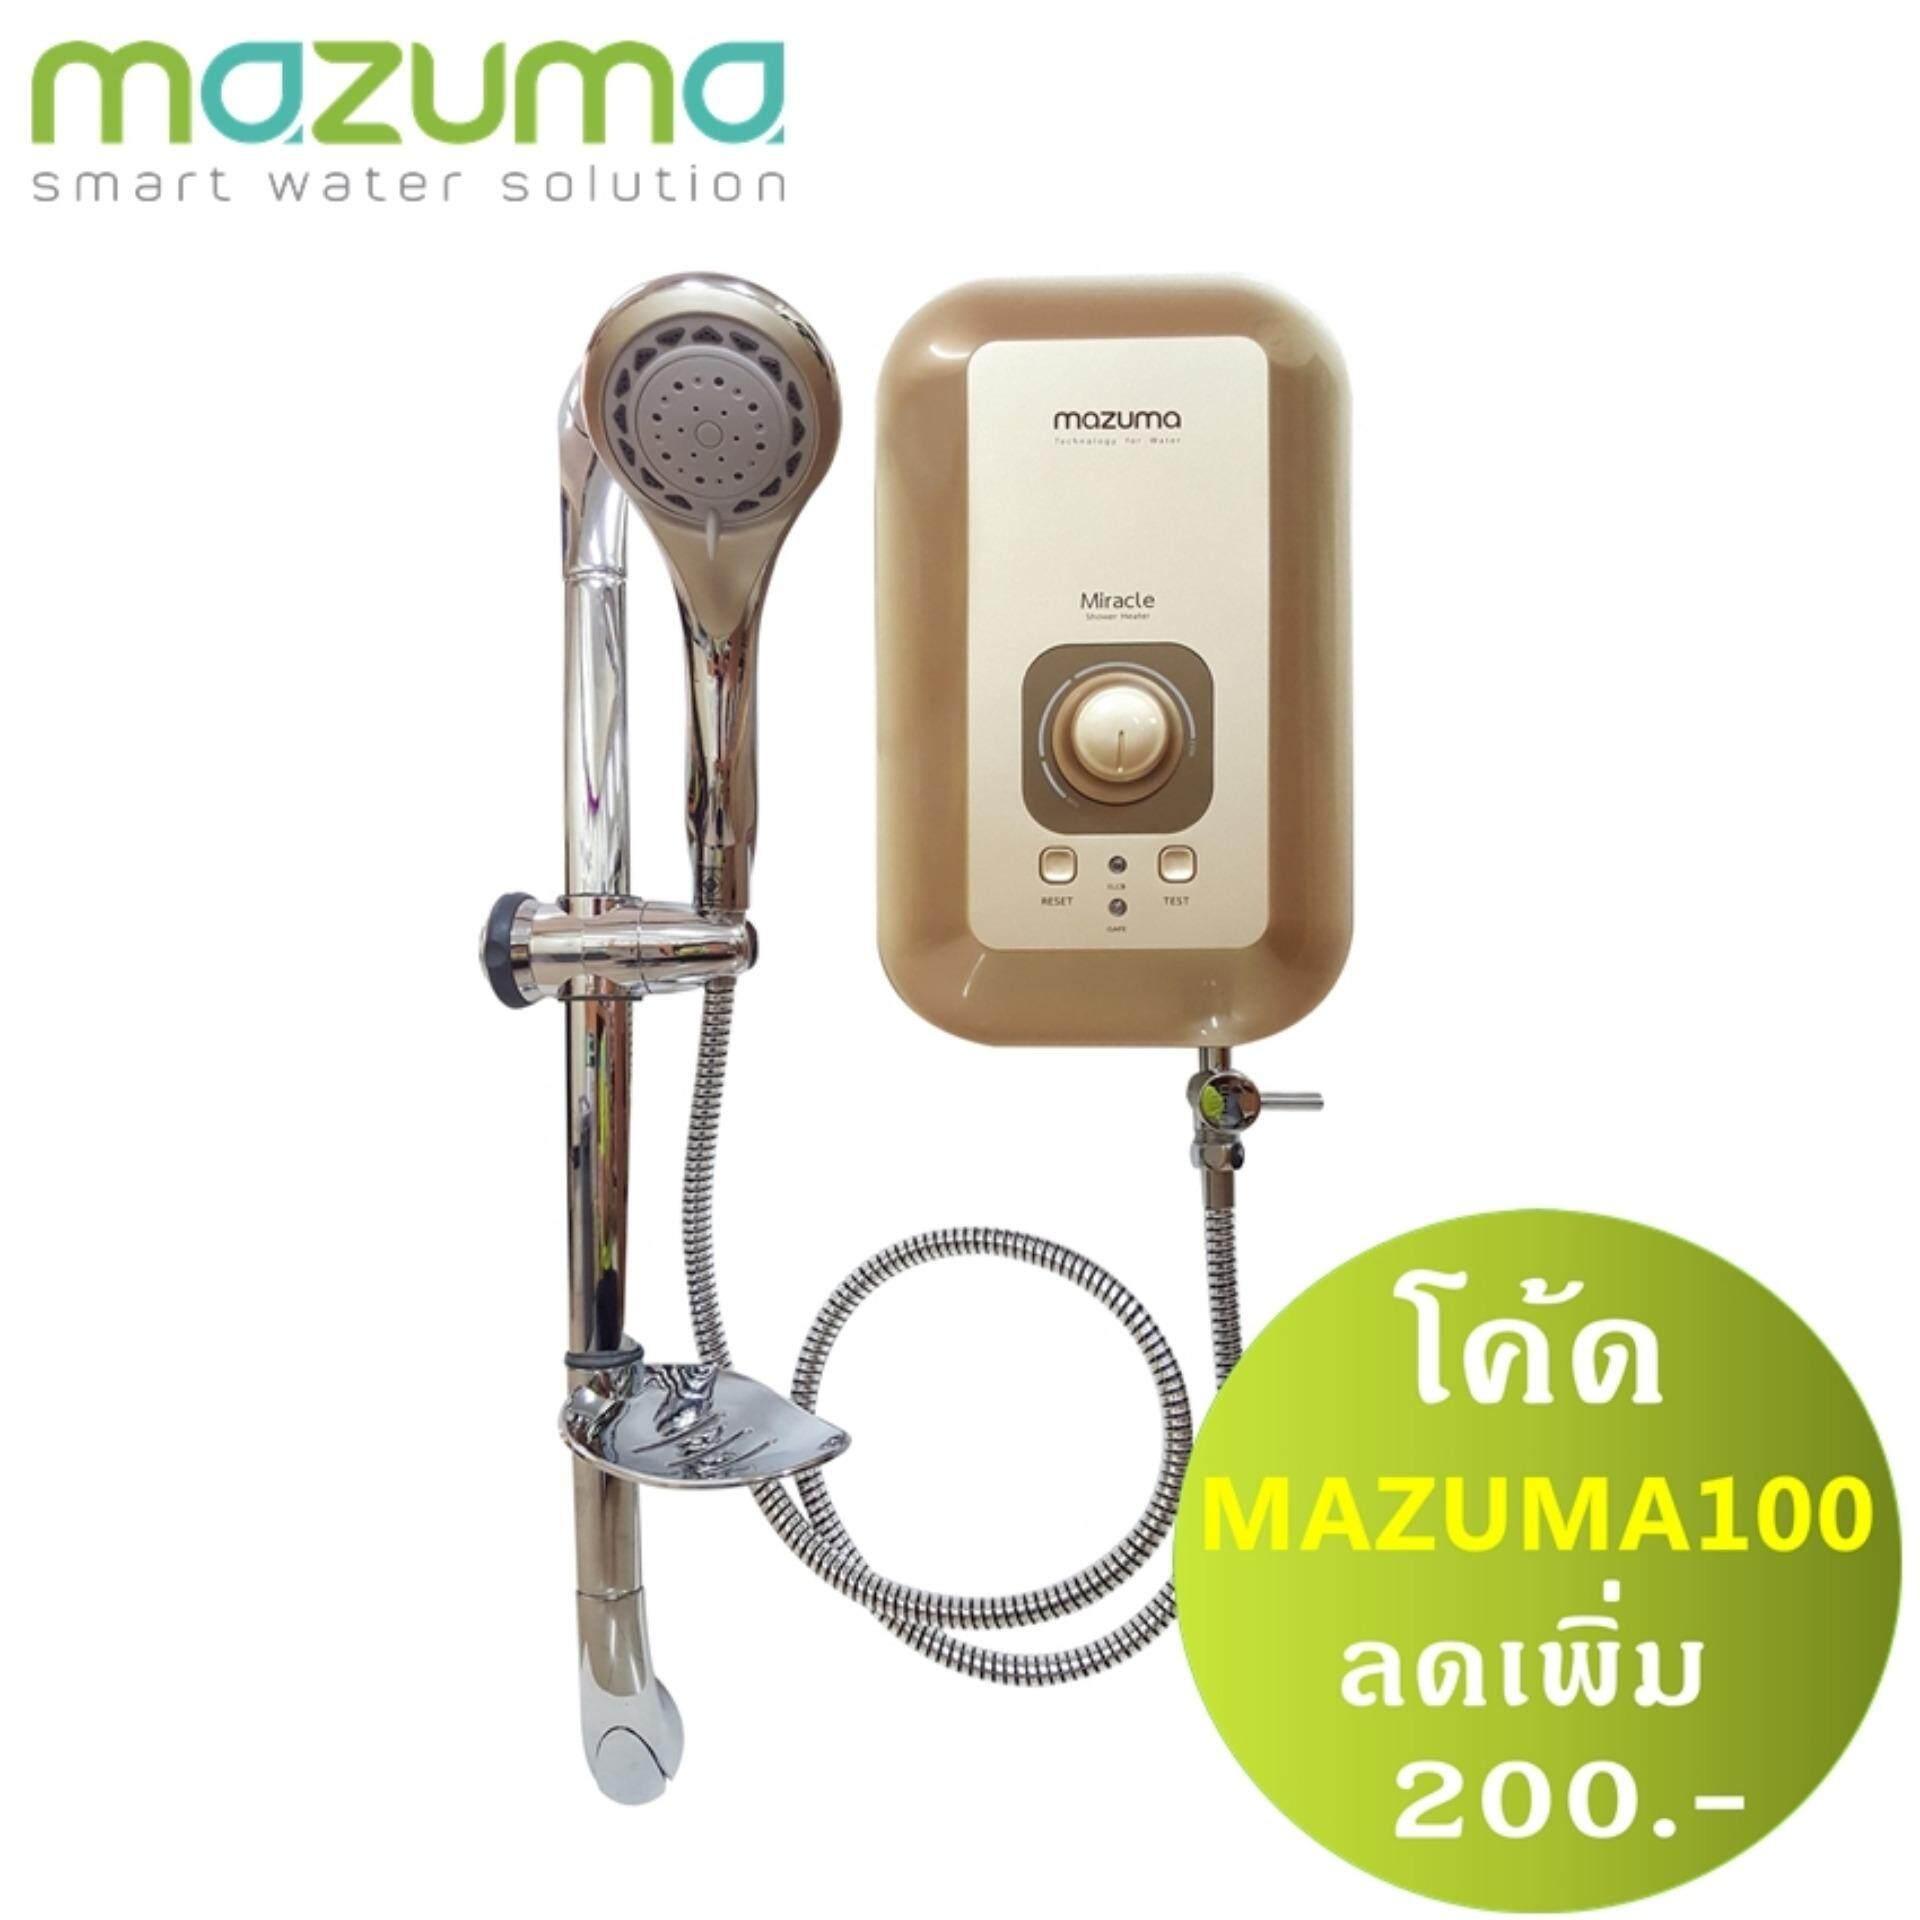 Mazuma เครื่องทำน้ำอุ่น รุ่น SP1-C45-LPM (Miracle Gold 4.5)